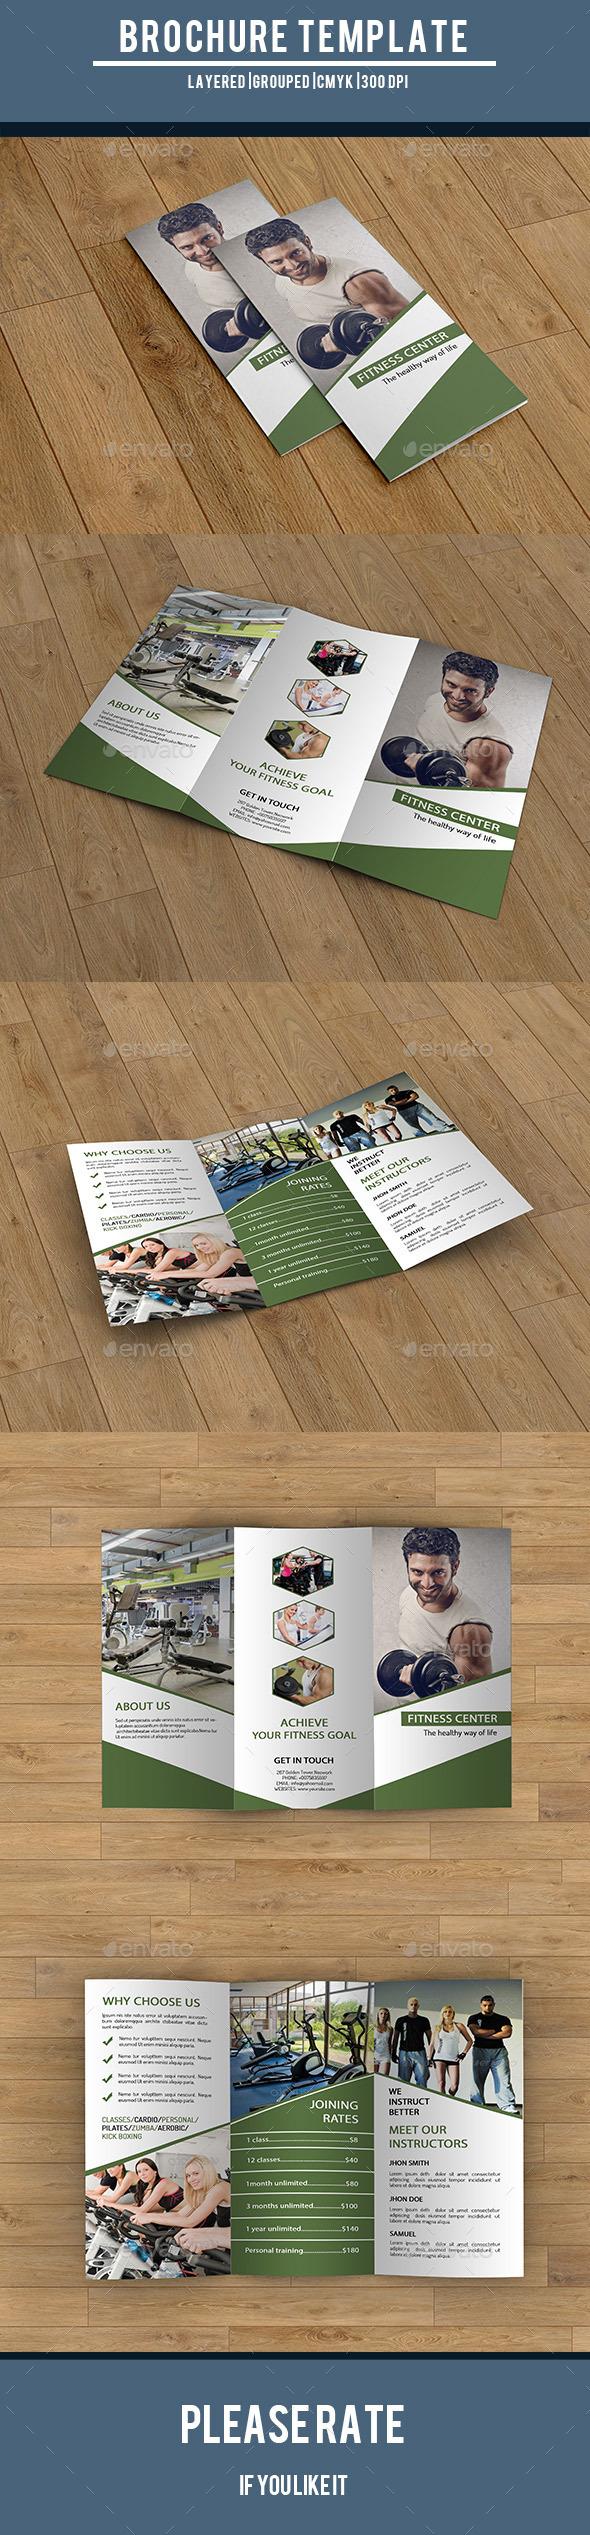 Trifold Brochure for Gym Center-V220 - Corporate Brochures